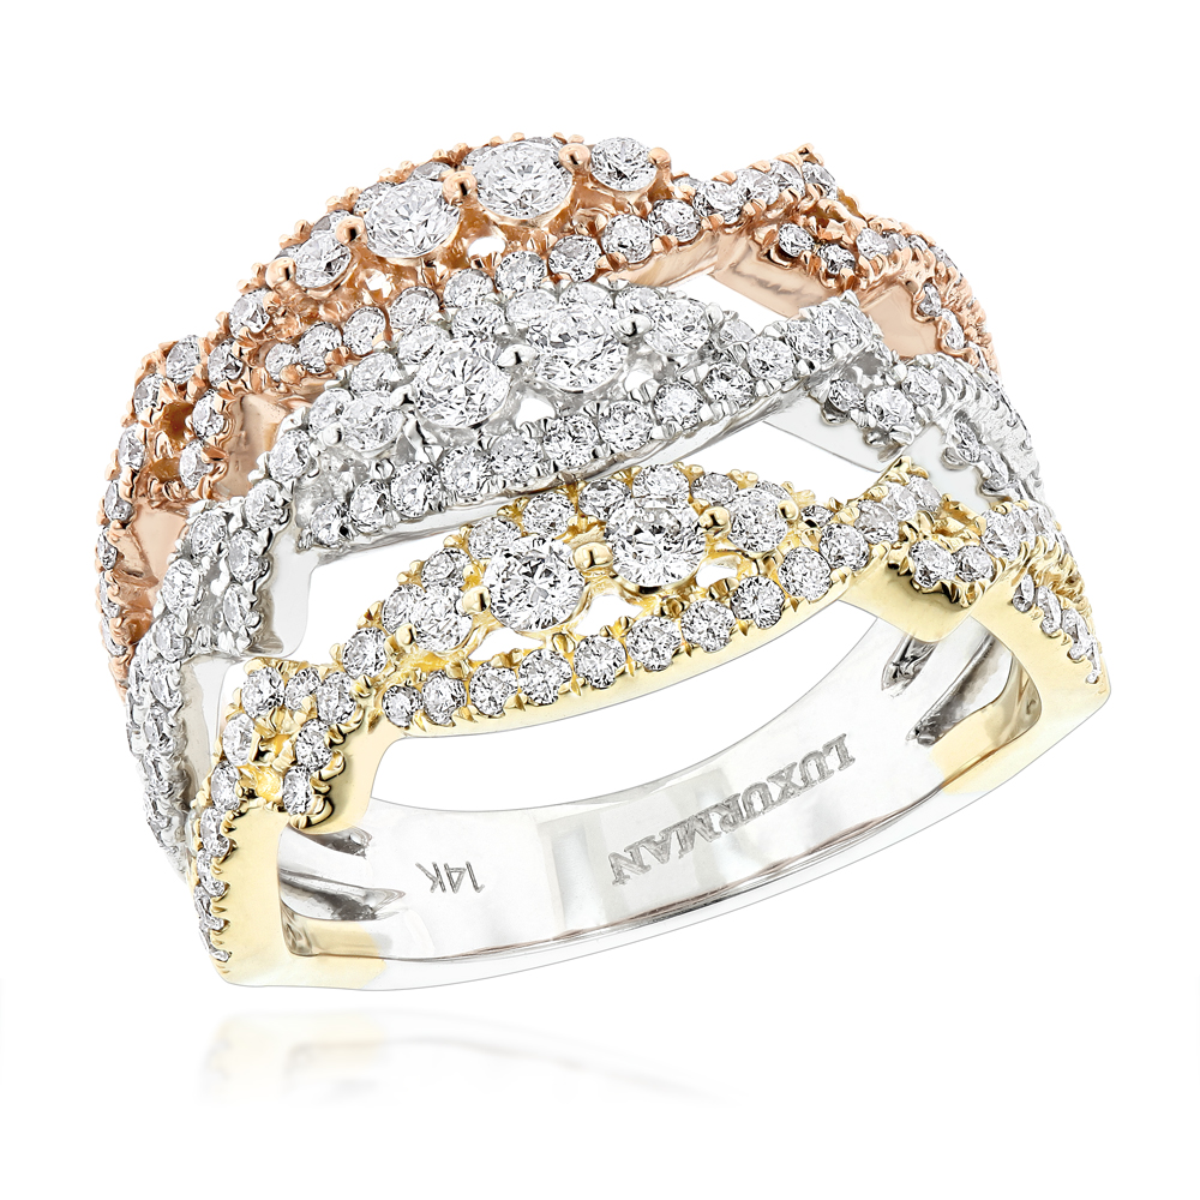 14K White Yellow Rose Gold Diamond Stacking Ring for Women 1.6c by Luxurman